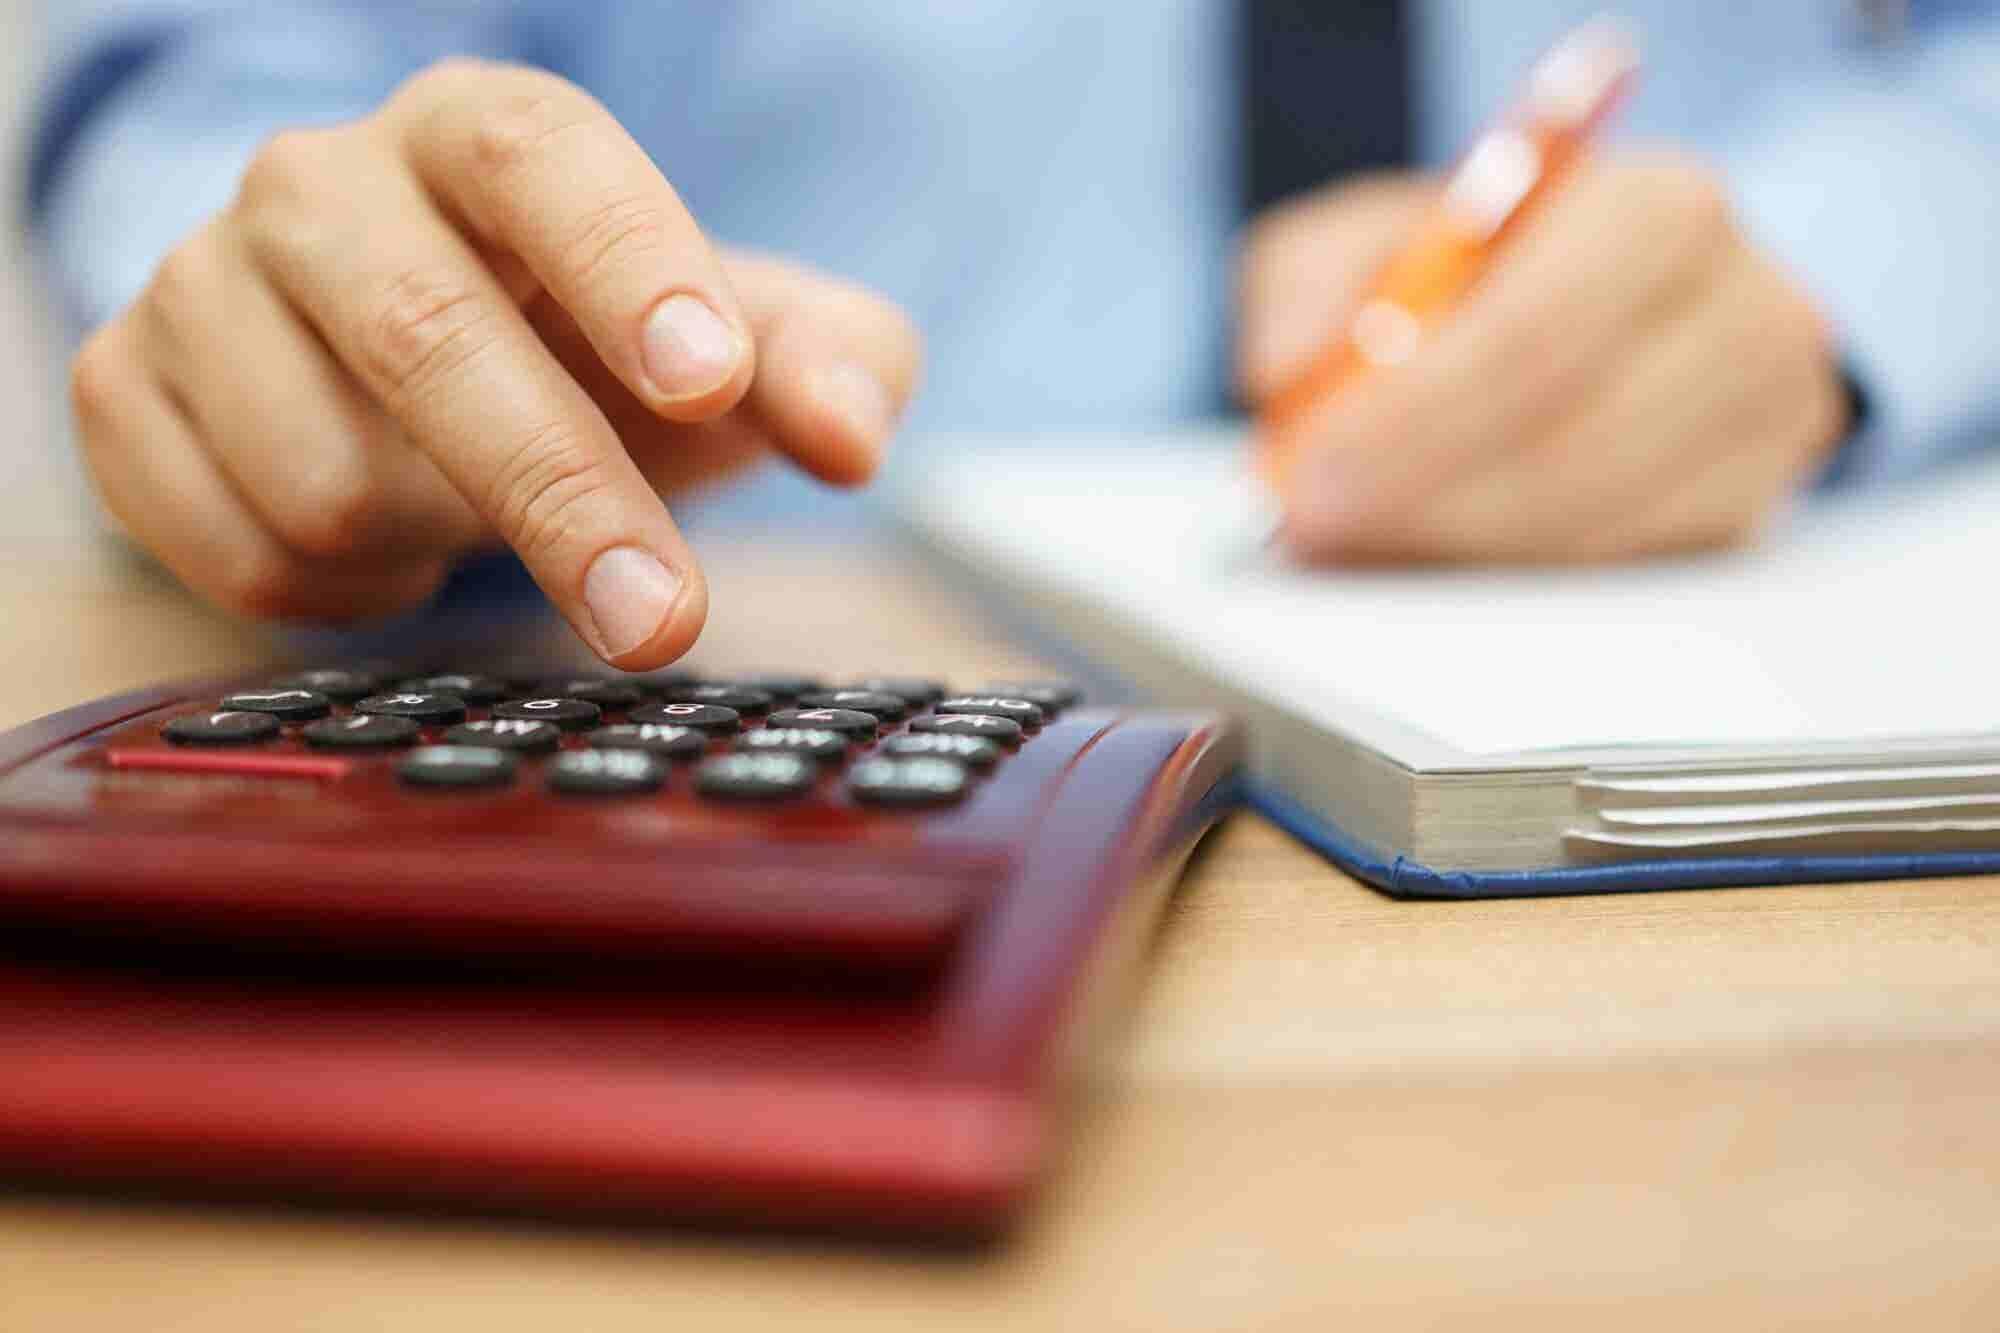 Free Webinar| Nov. 15: Smart Solutions to Manage Accounts Payable Like a Pro